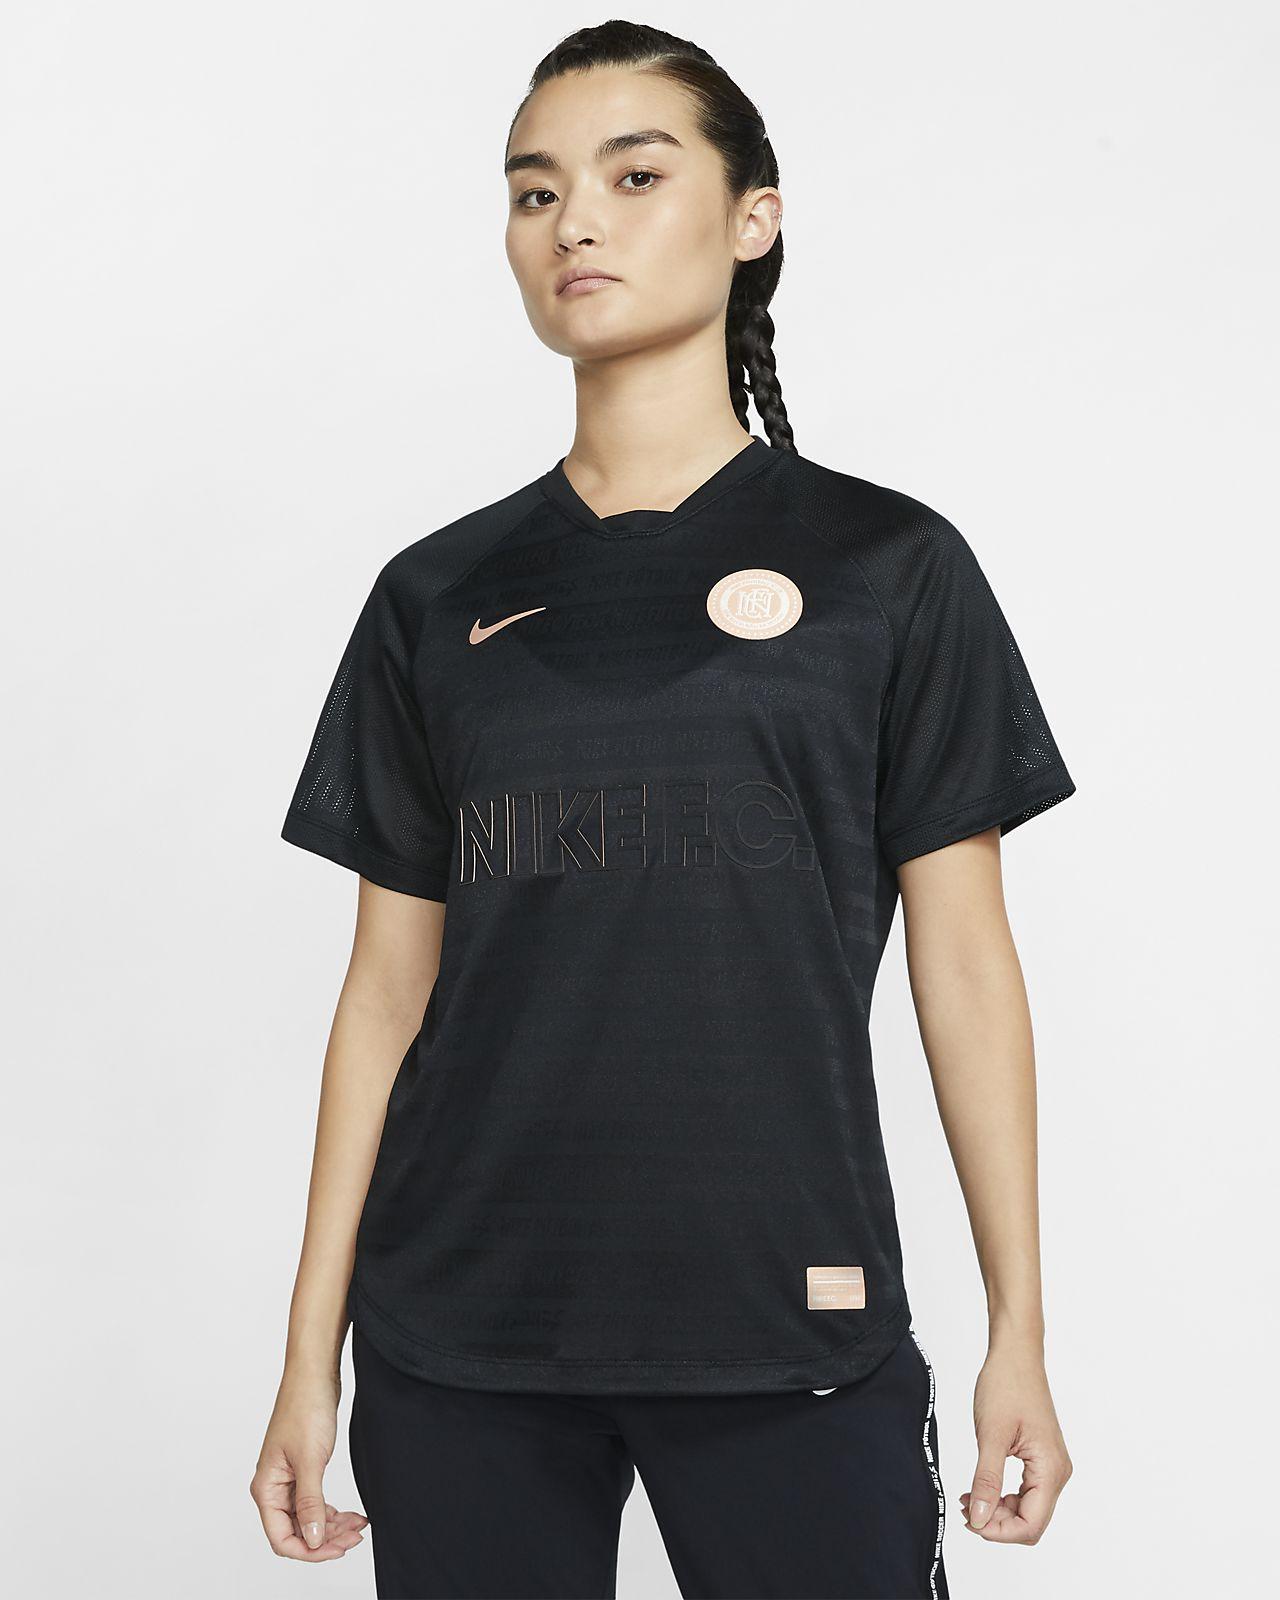 Dámský fotbalový dres Nike F.C. Dri-FIT